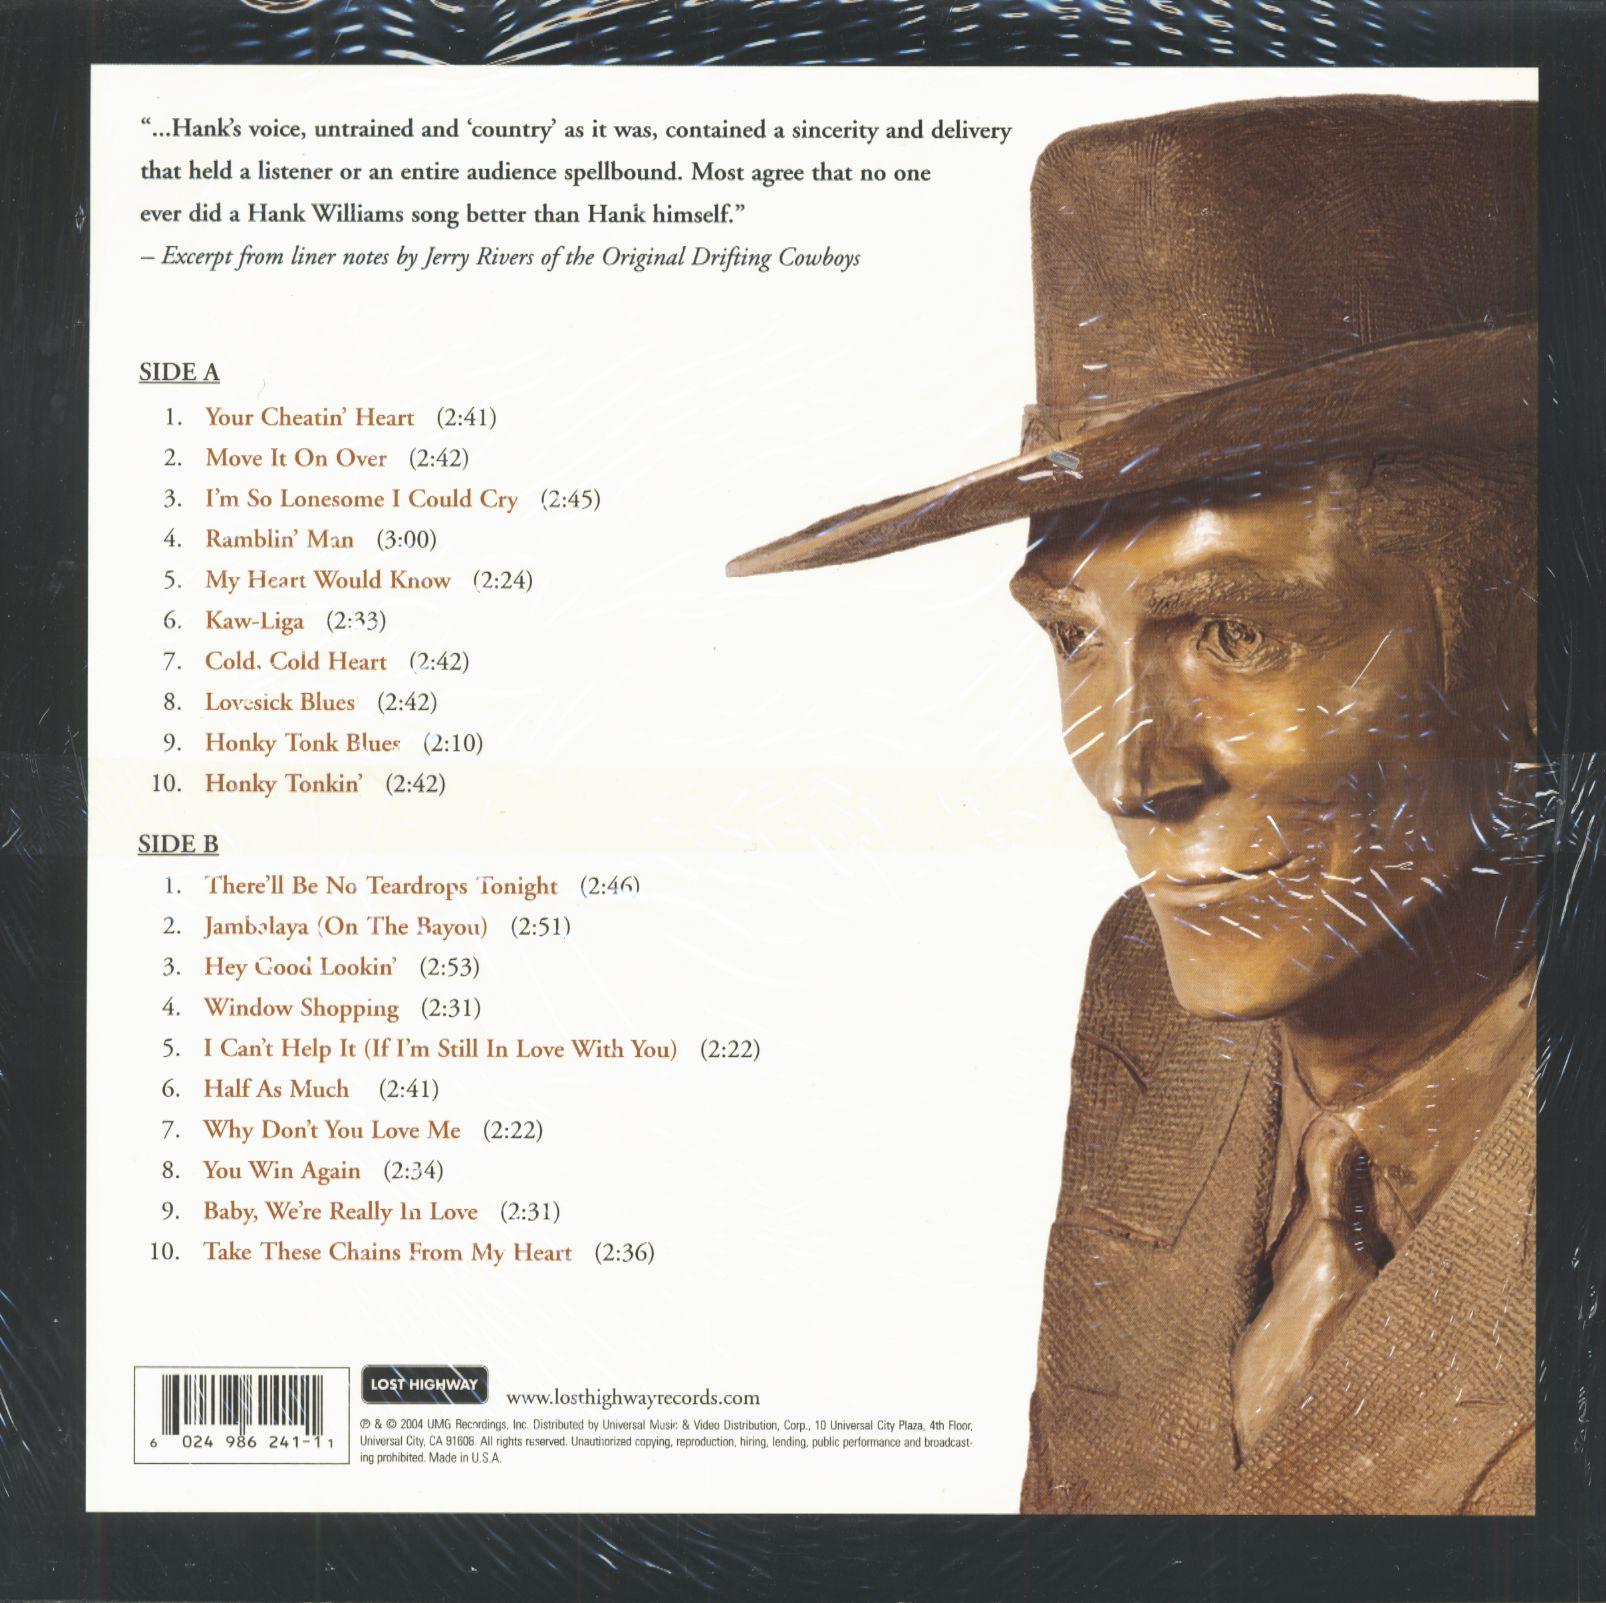 Hank Williams Lp 20 Of Hank William S Greatest Hits